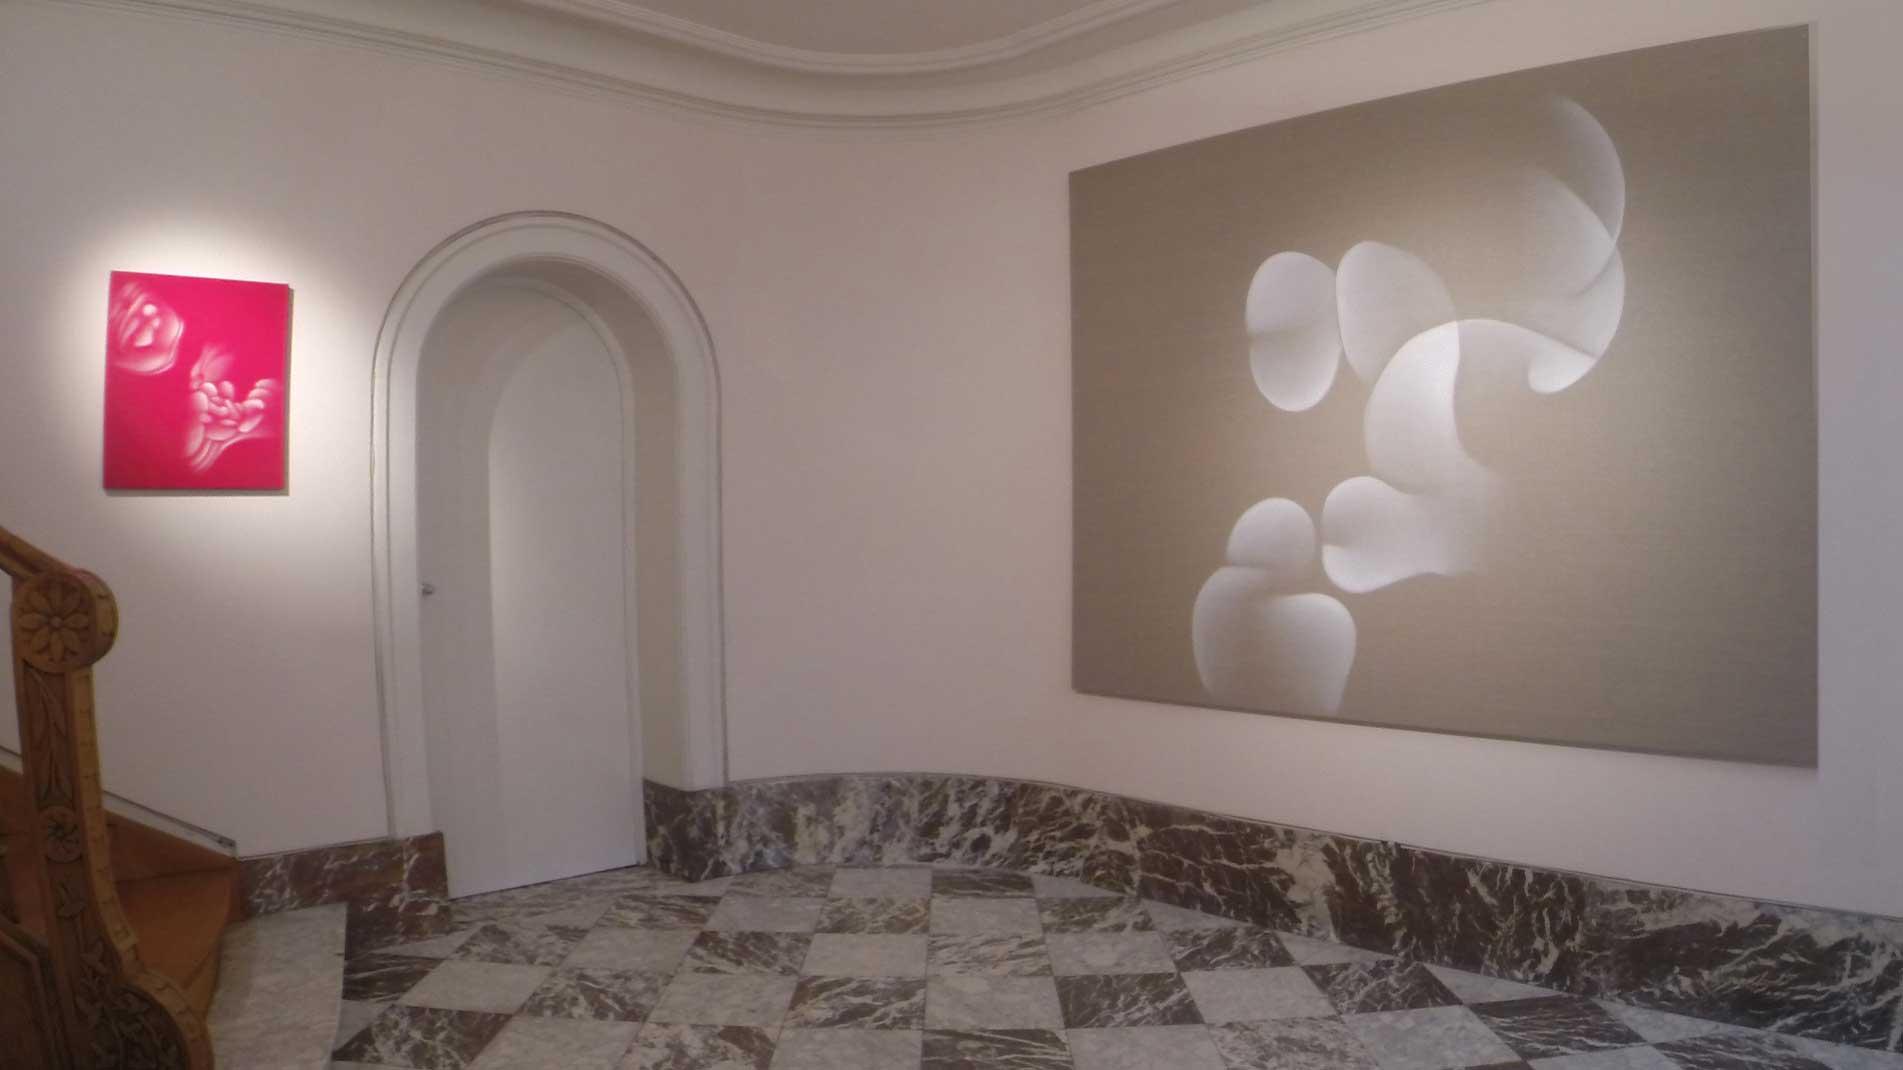 Guillaume Bottazzi - Galerie Artiscope, Bruxelles, 2016